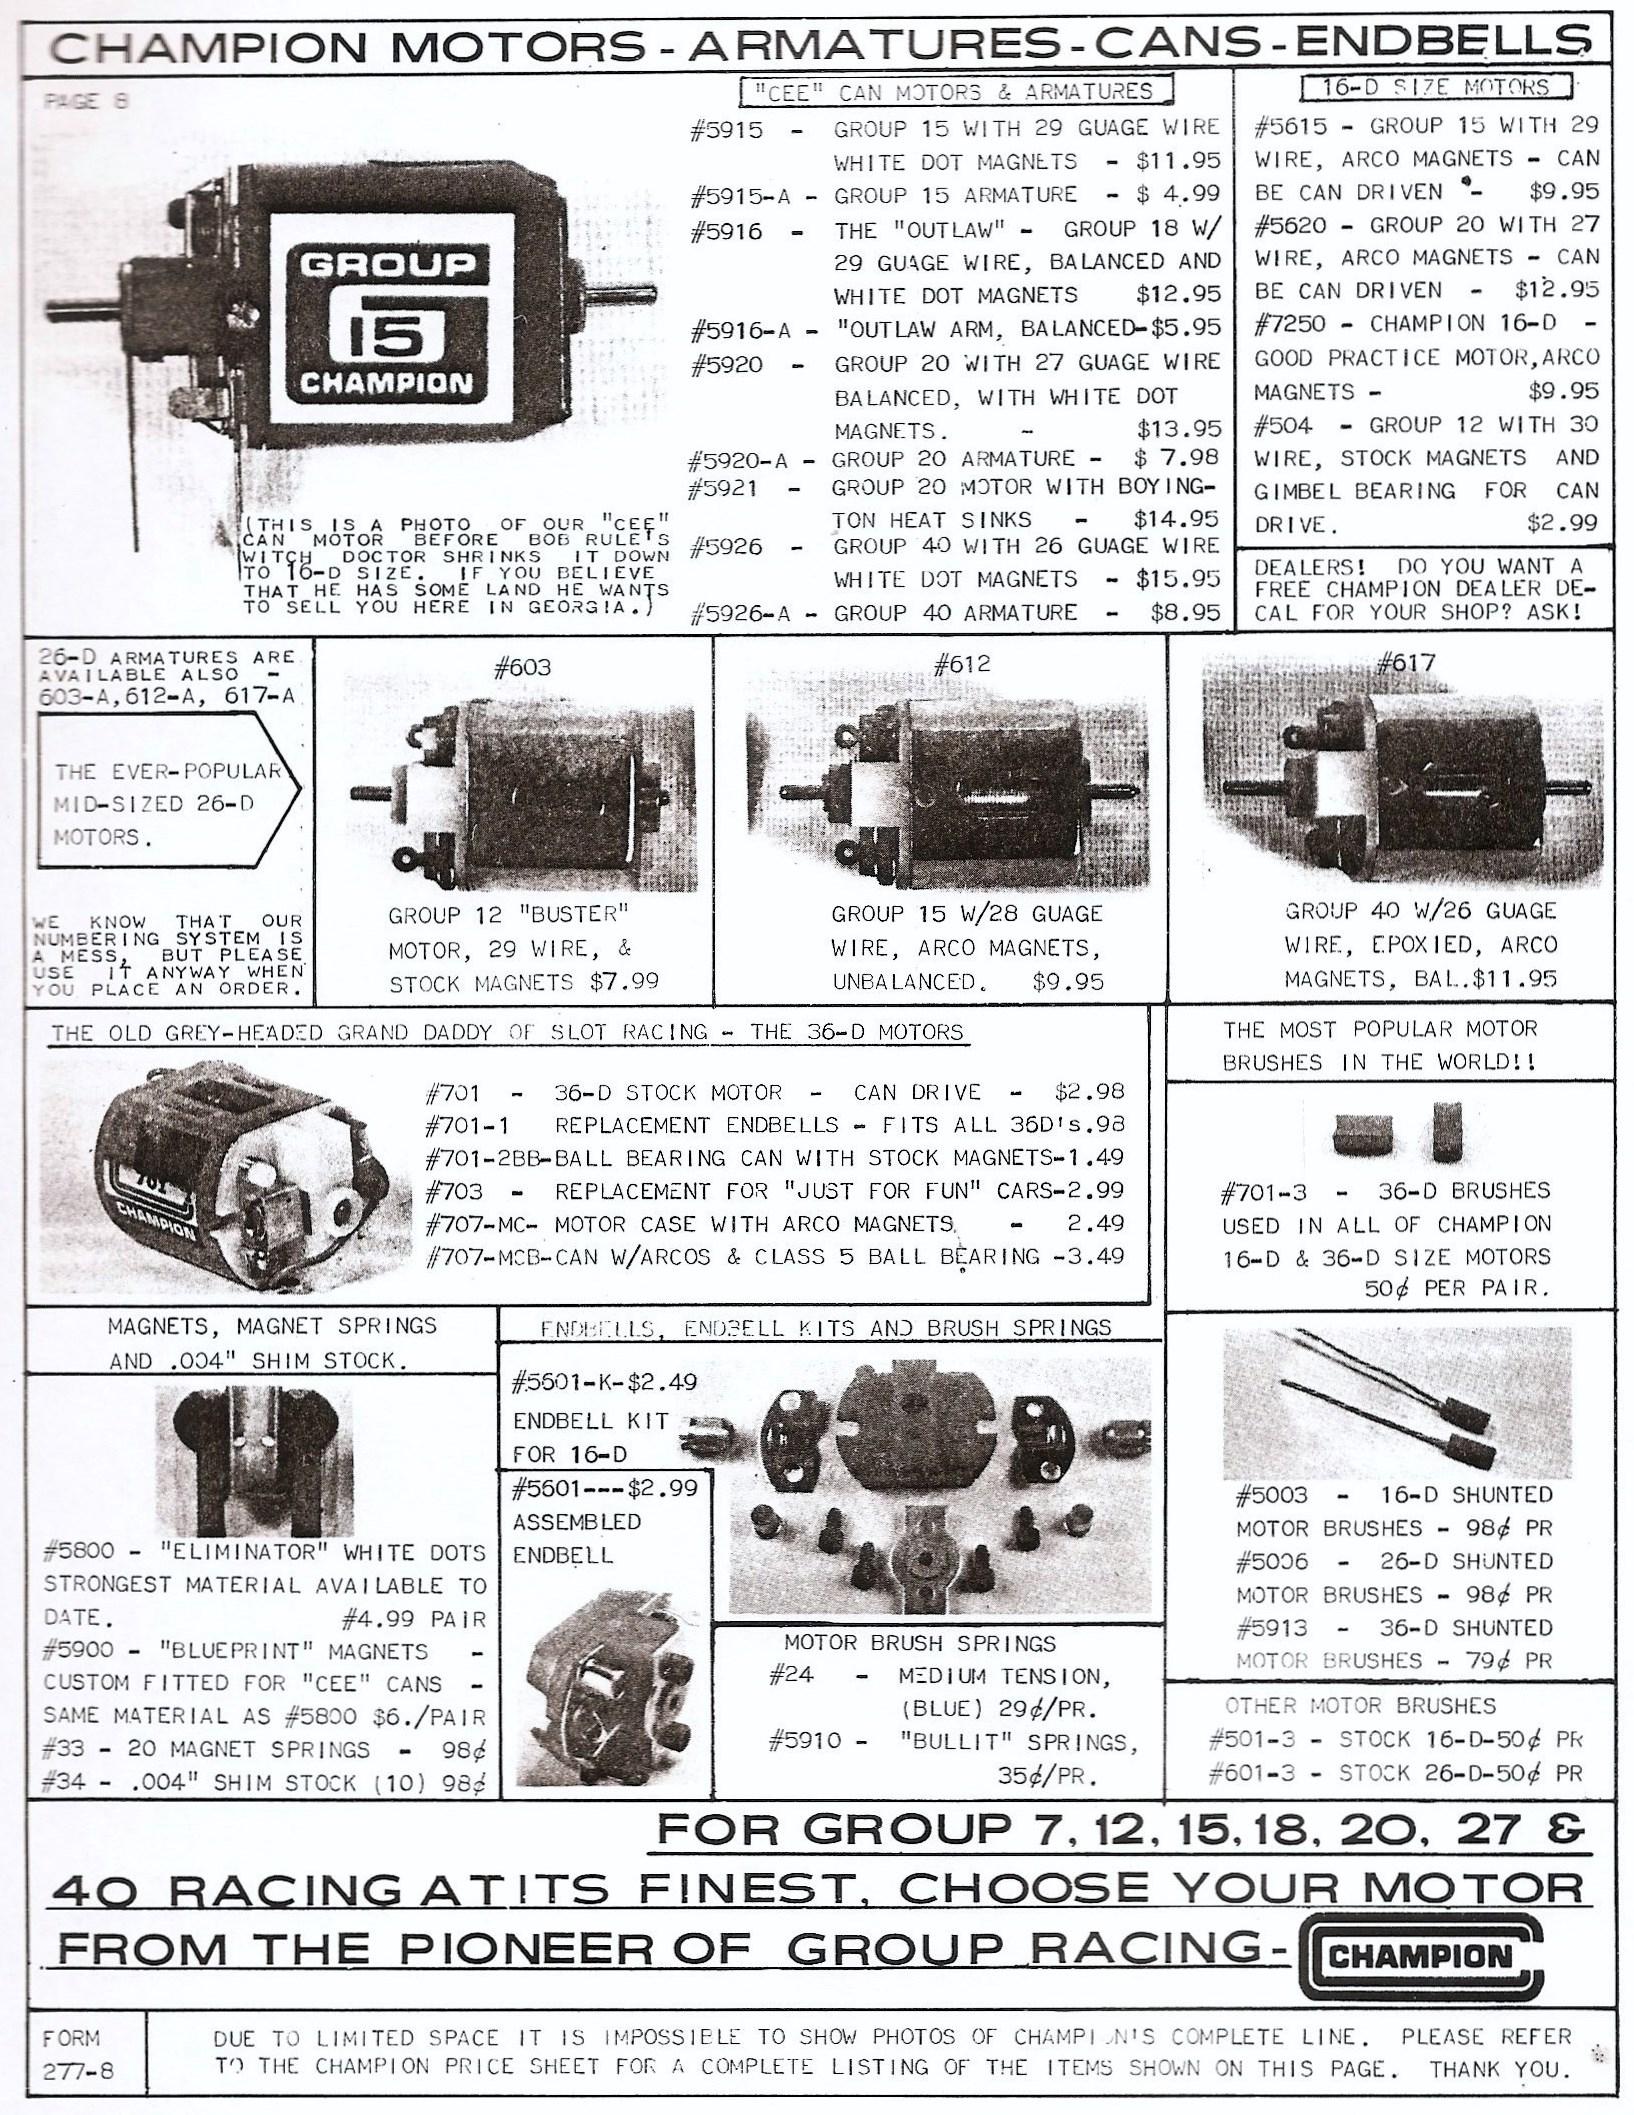 1977 Champion Catalog0005.jpg